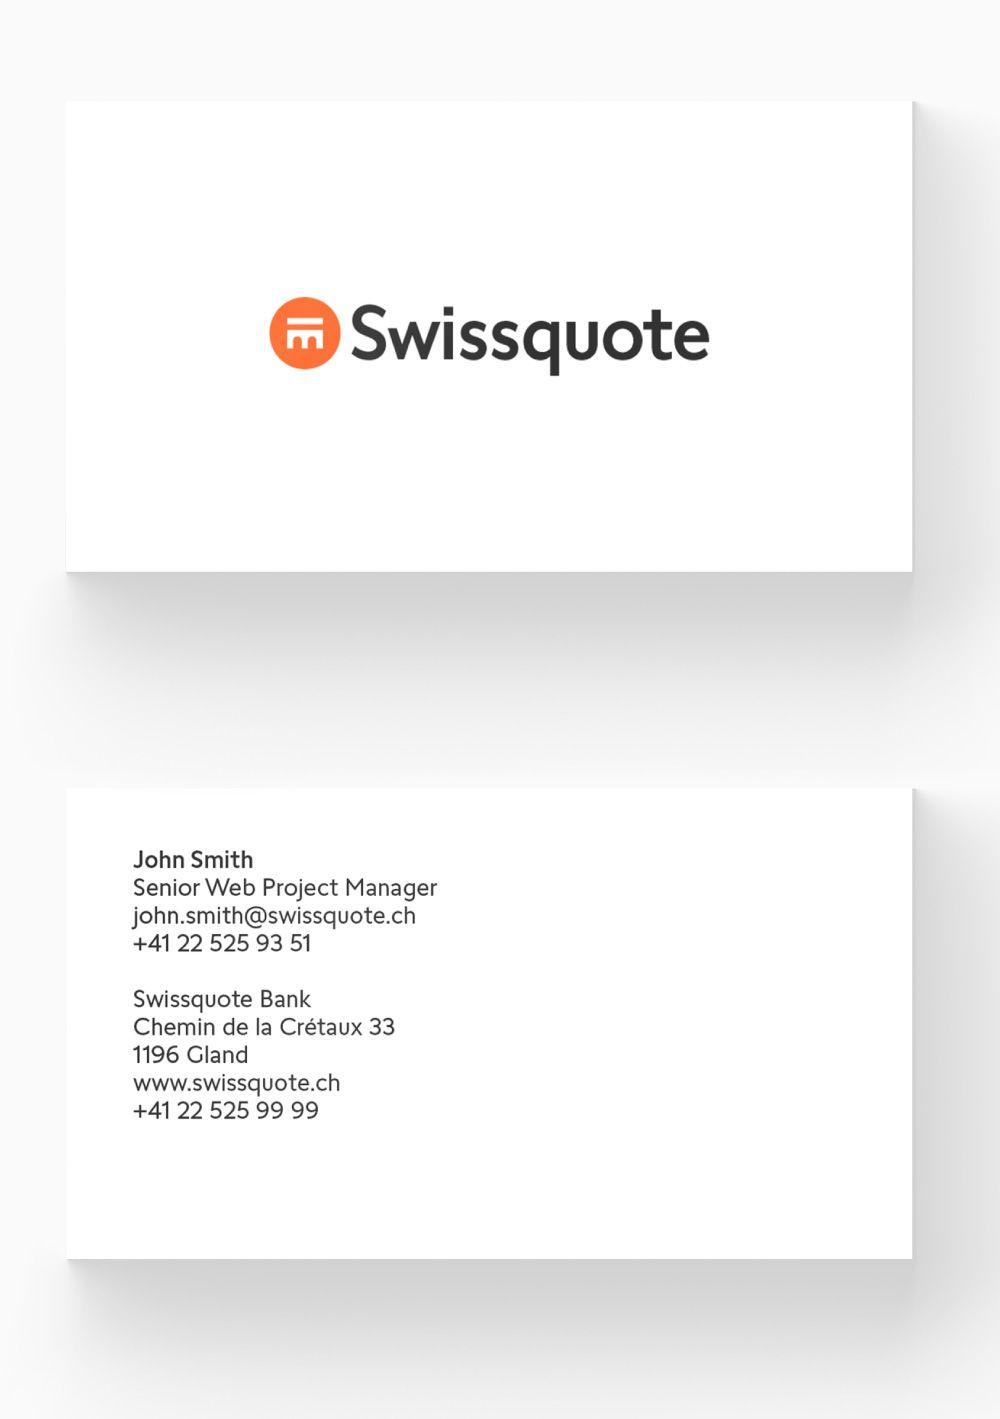 New Logo And Identity For Swissquote By Maskin Identity Logo Stationery Branding Branding Materials